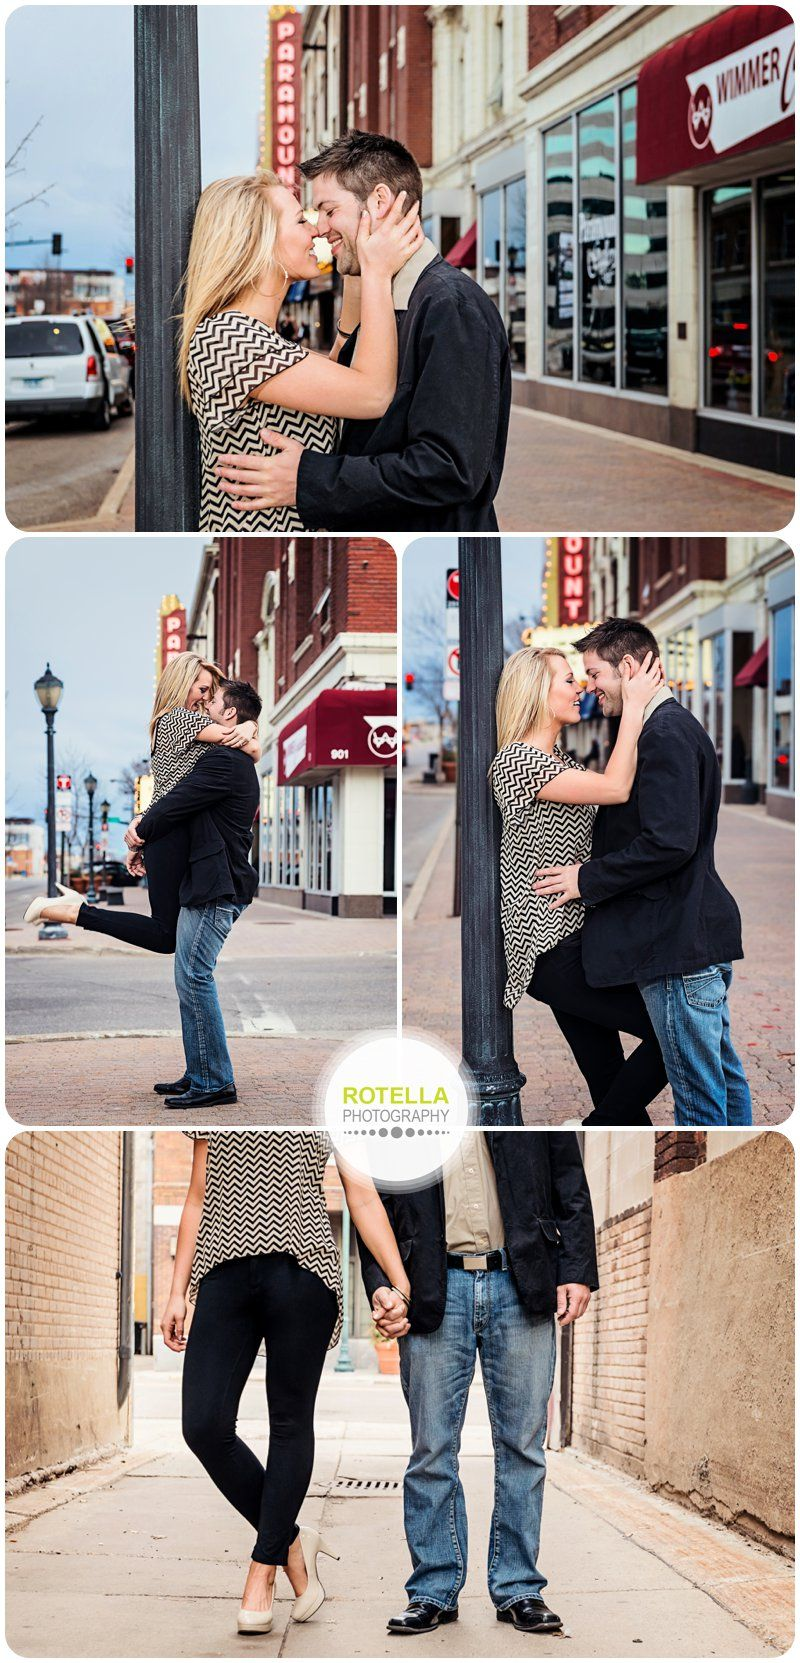 MD-MINNESOTA-WEDDING-PHOTOGRAPHY-ROTELLA-PHOTOGRAPHY_0026